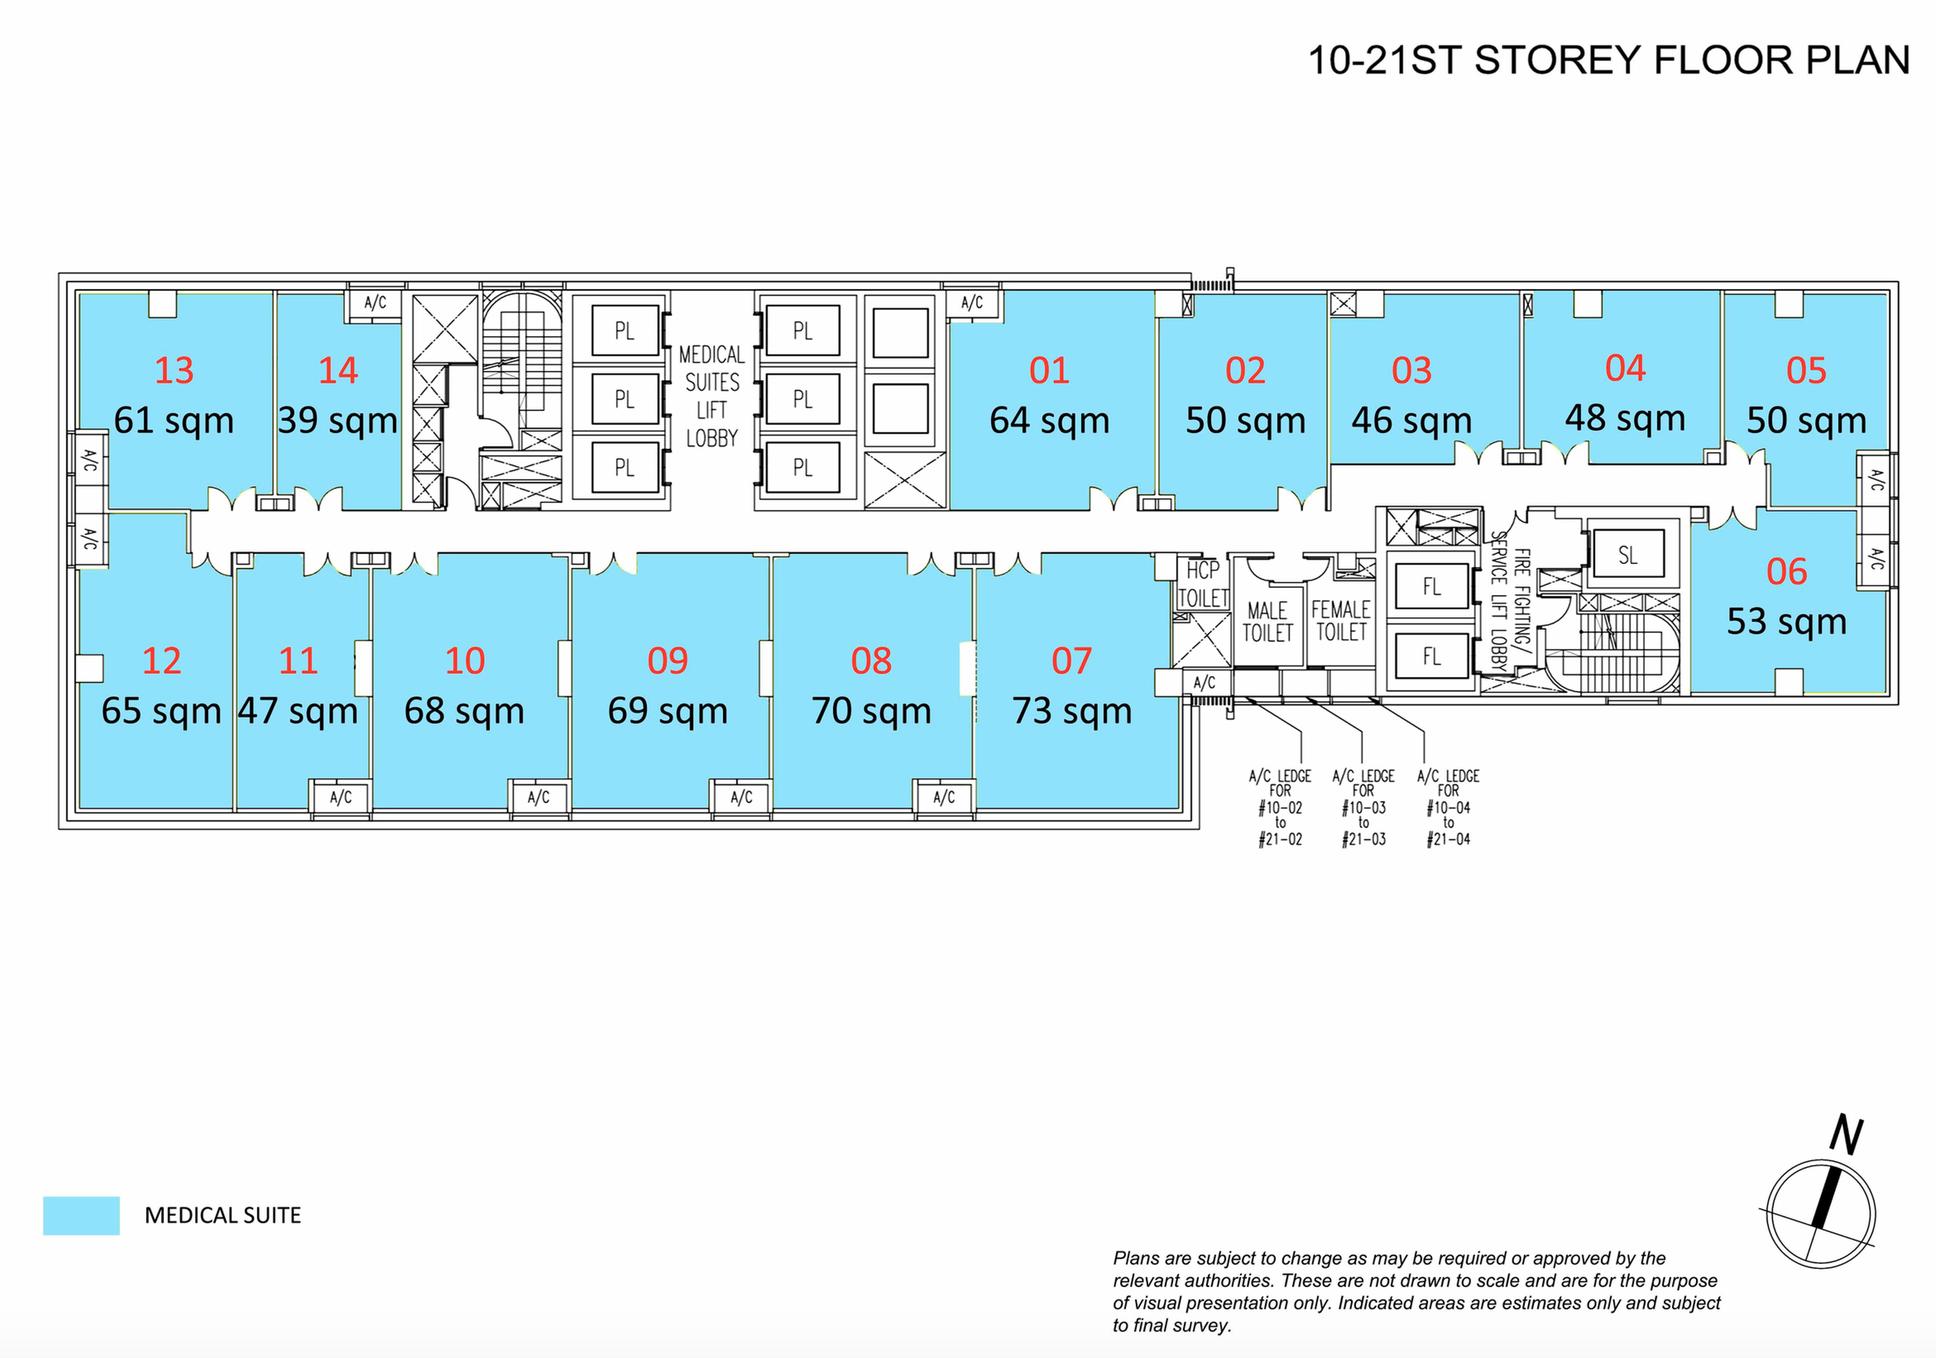 10th - 22nd Storey Floor Plan